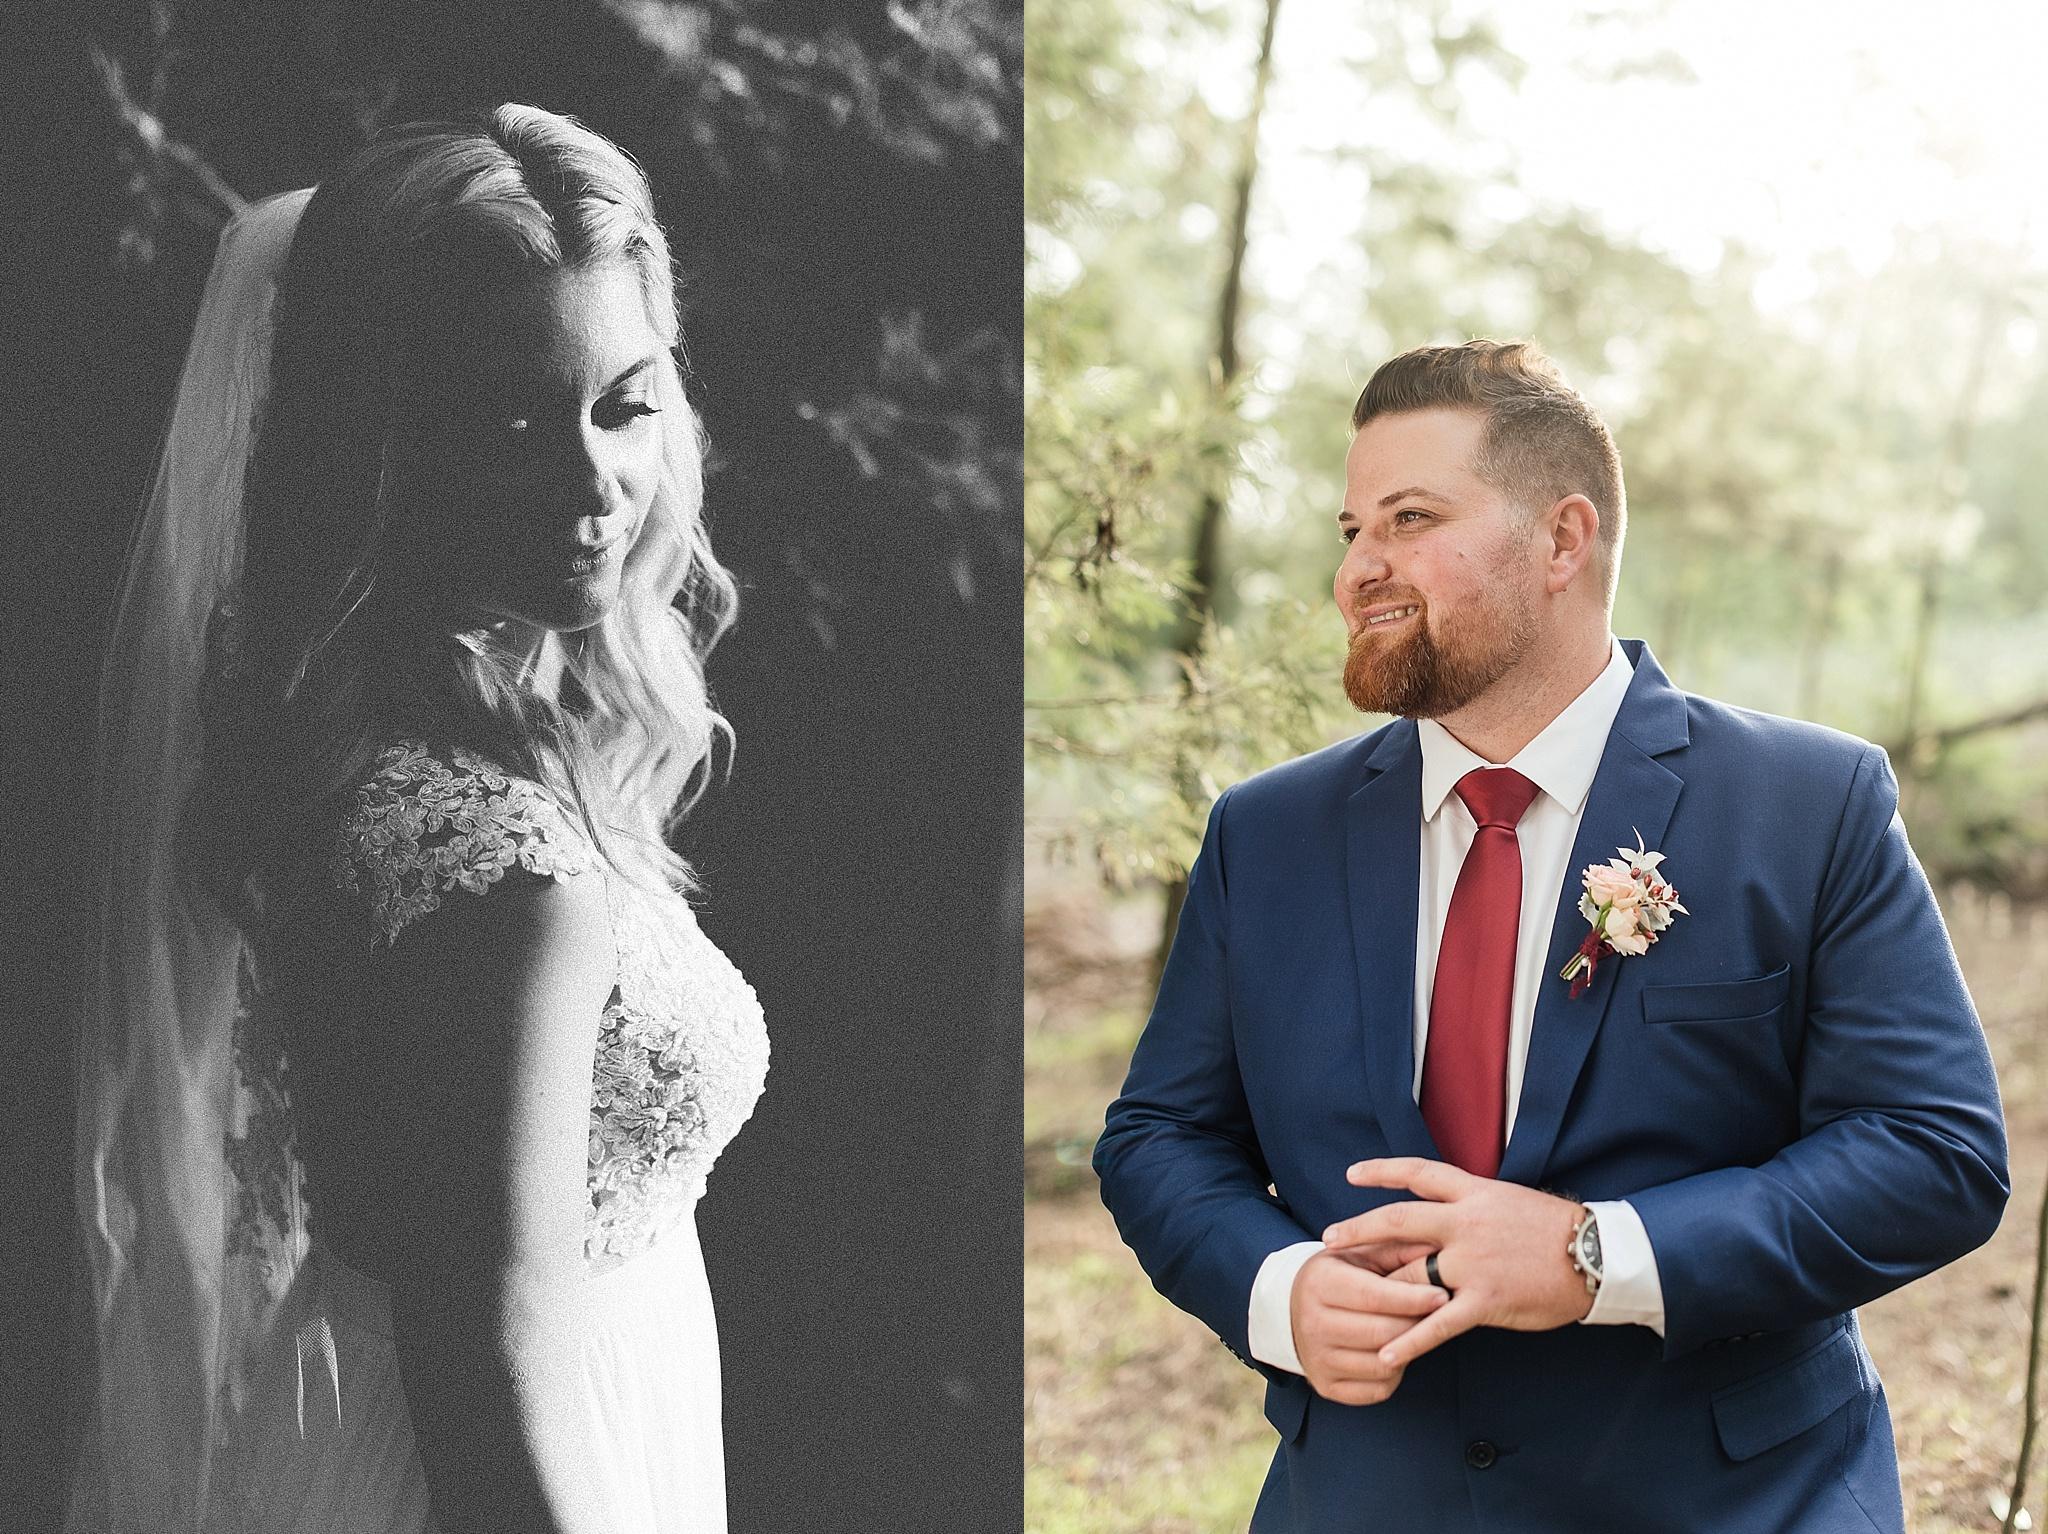 Cape Town Photographer Darren Bester - Die Woud Wedding - Gareth & Roxanne_0030.jpg